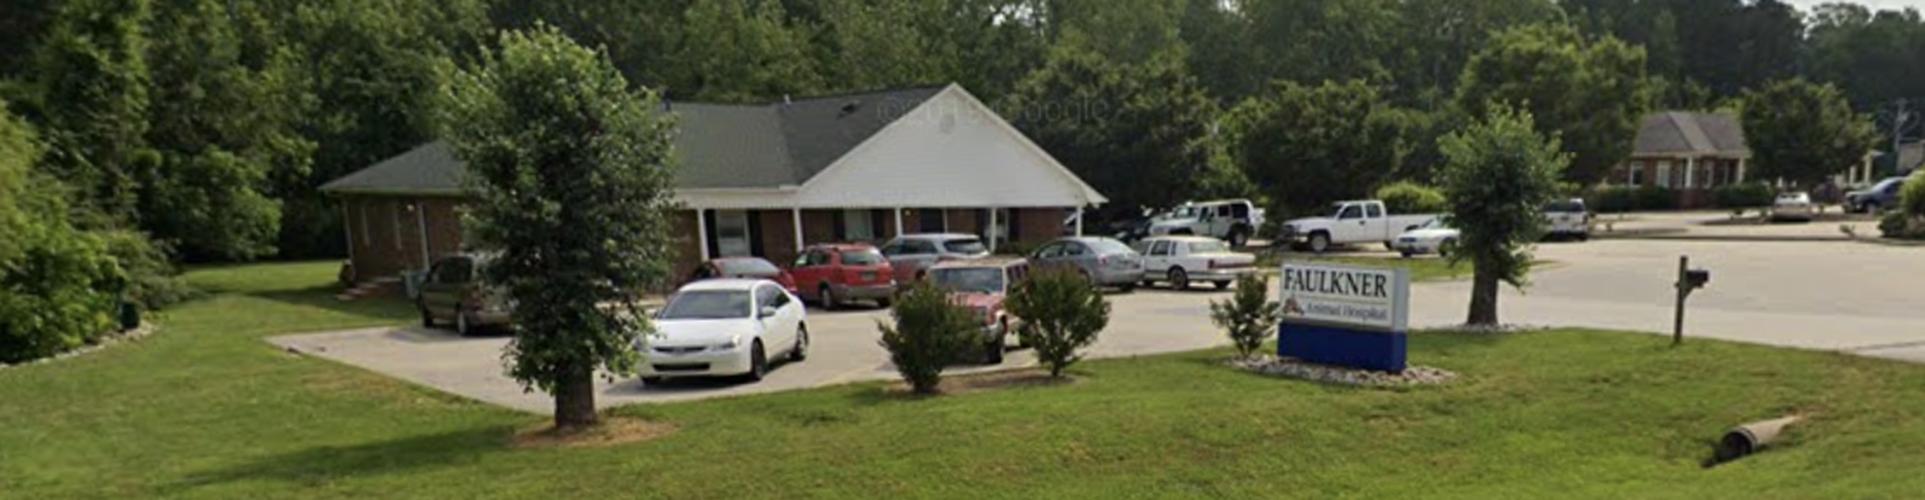 faulkner-animal-hospital-lancaster-south-carolina